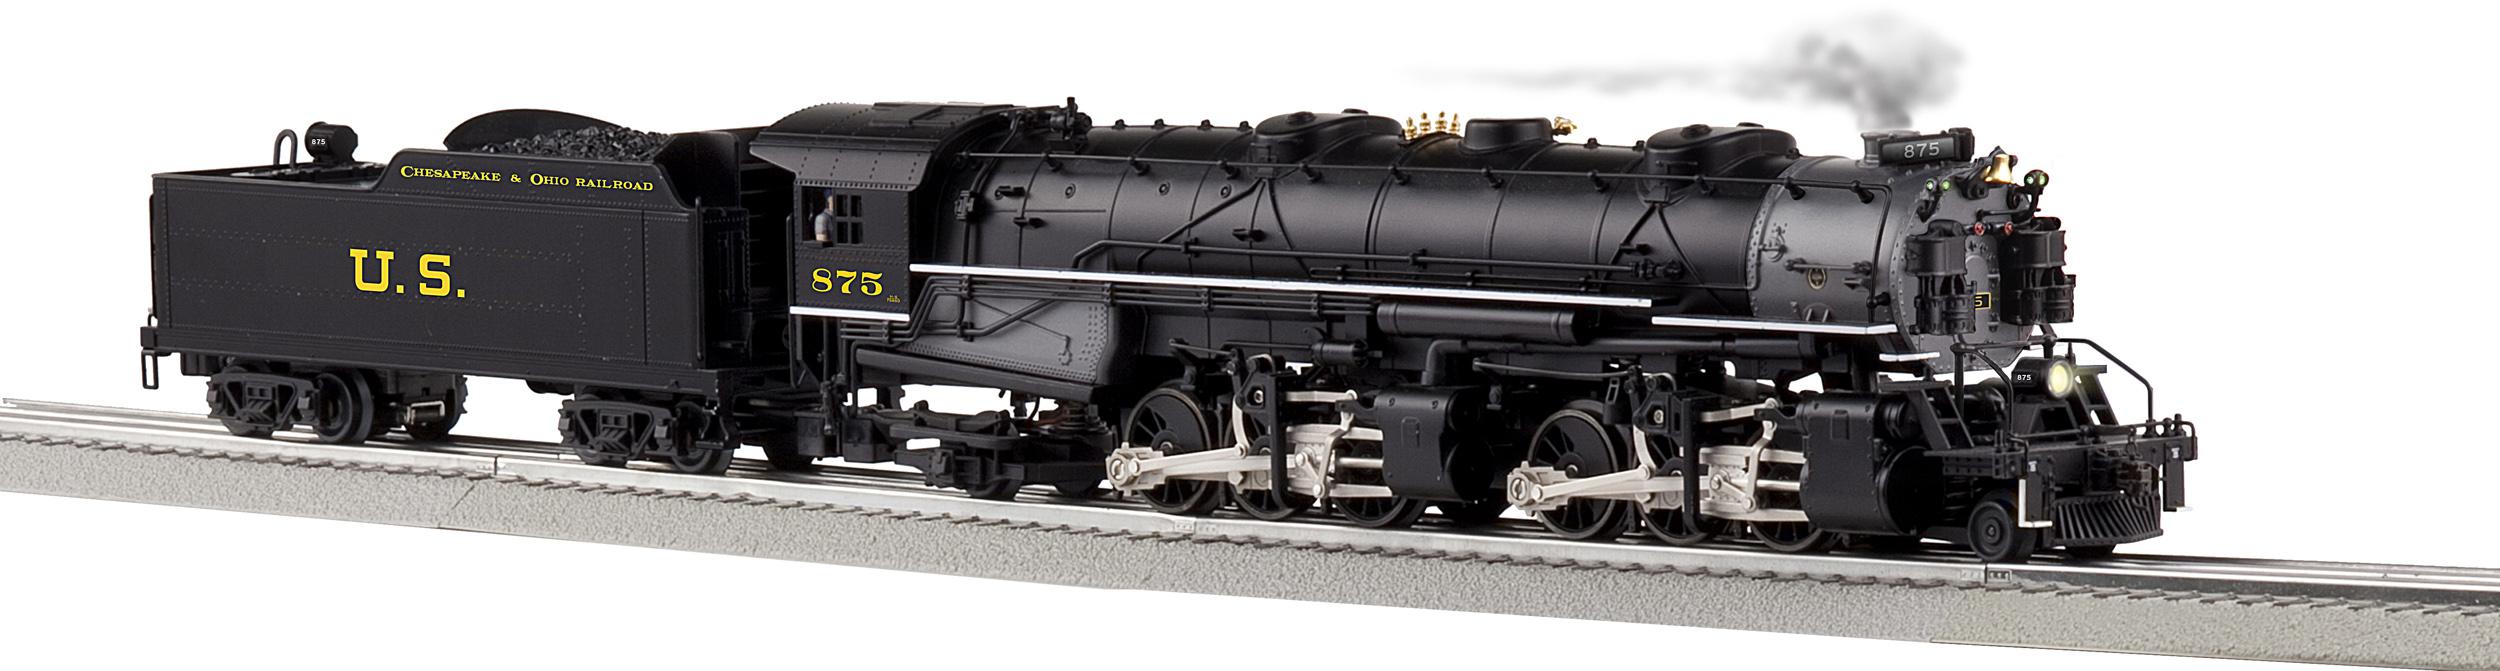 Lionel Train 675 Engine Wiring Diagram - Trusted Wiring Diagram •